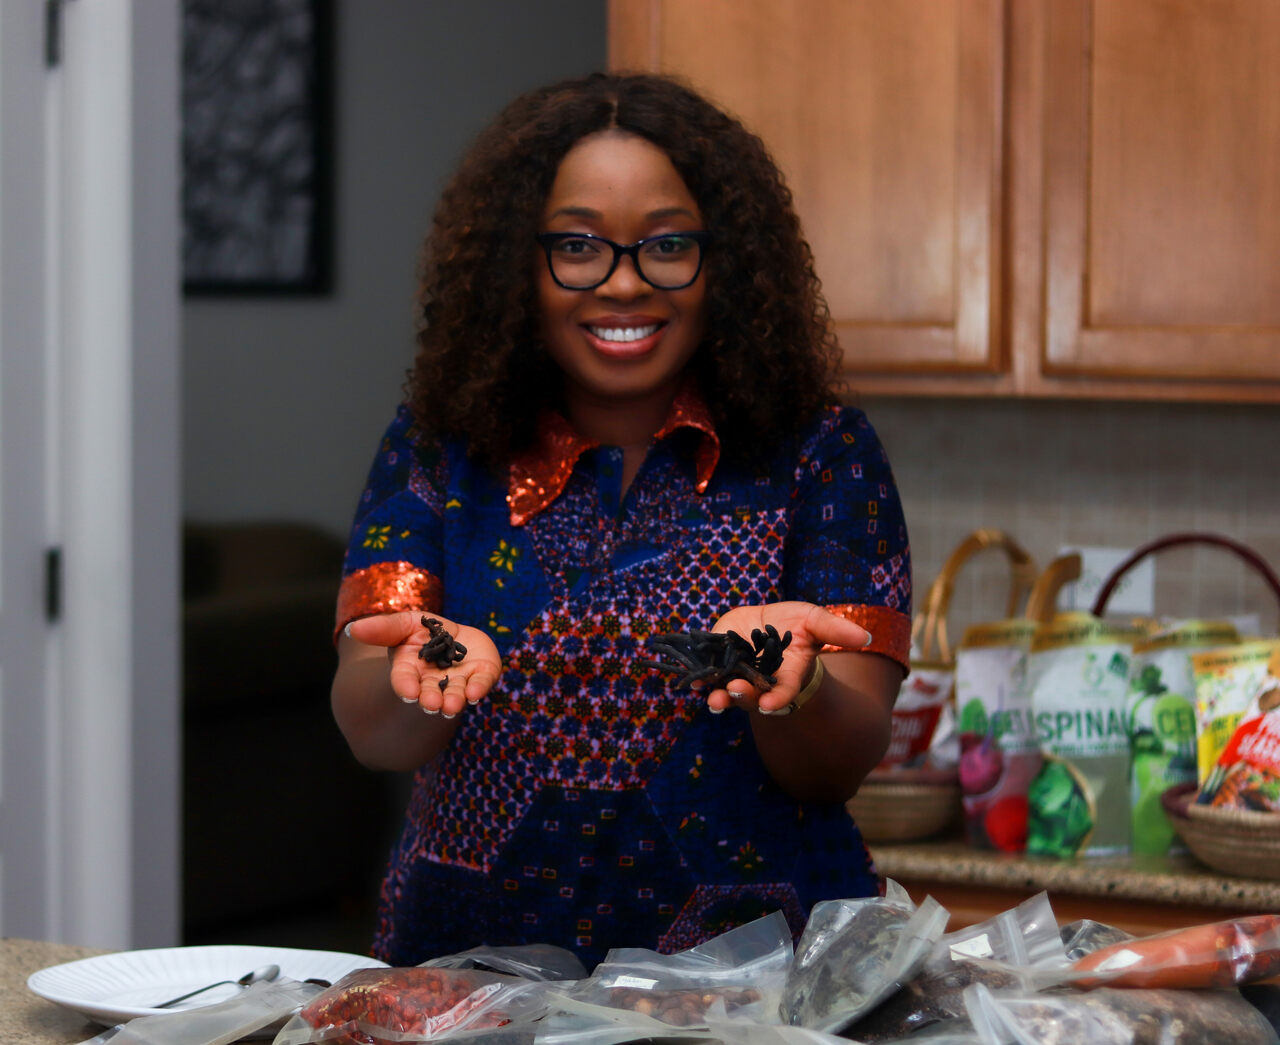 Iya Foods founder Toyin Kolawole showcases the company's Nigerian-inspired spices and seasonings.